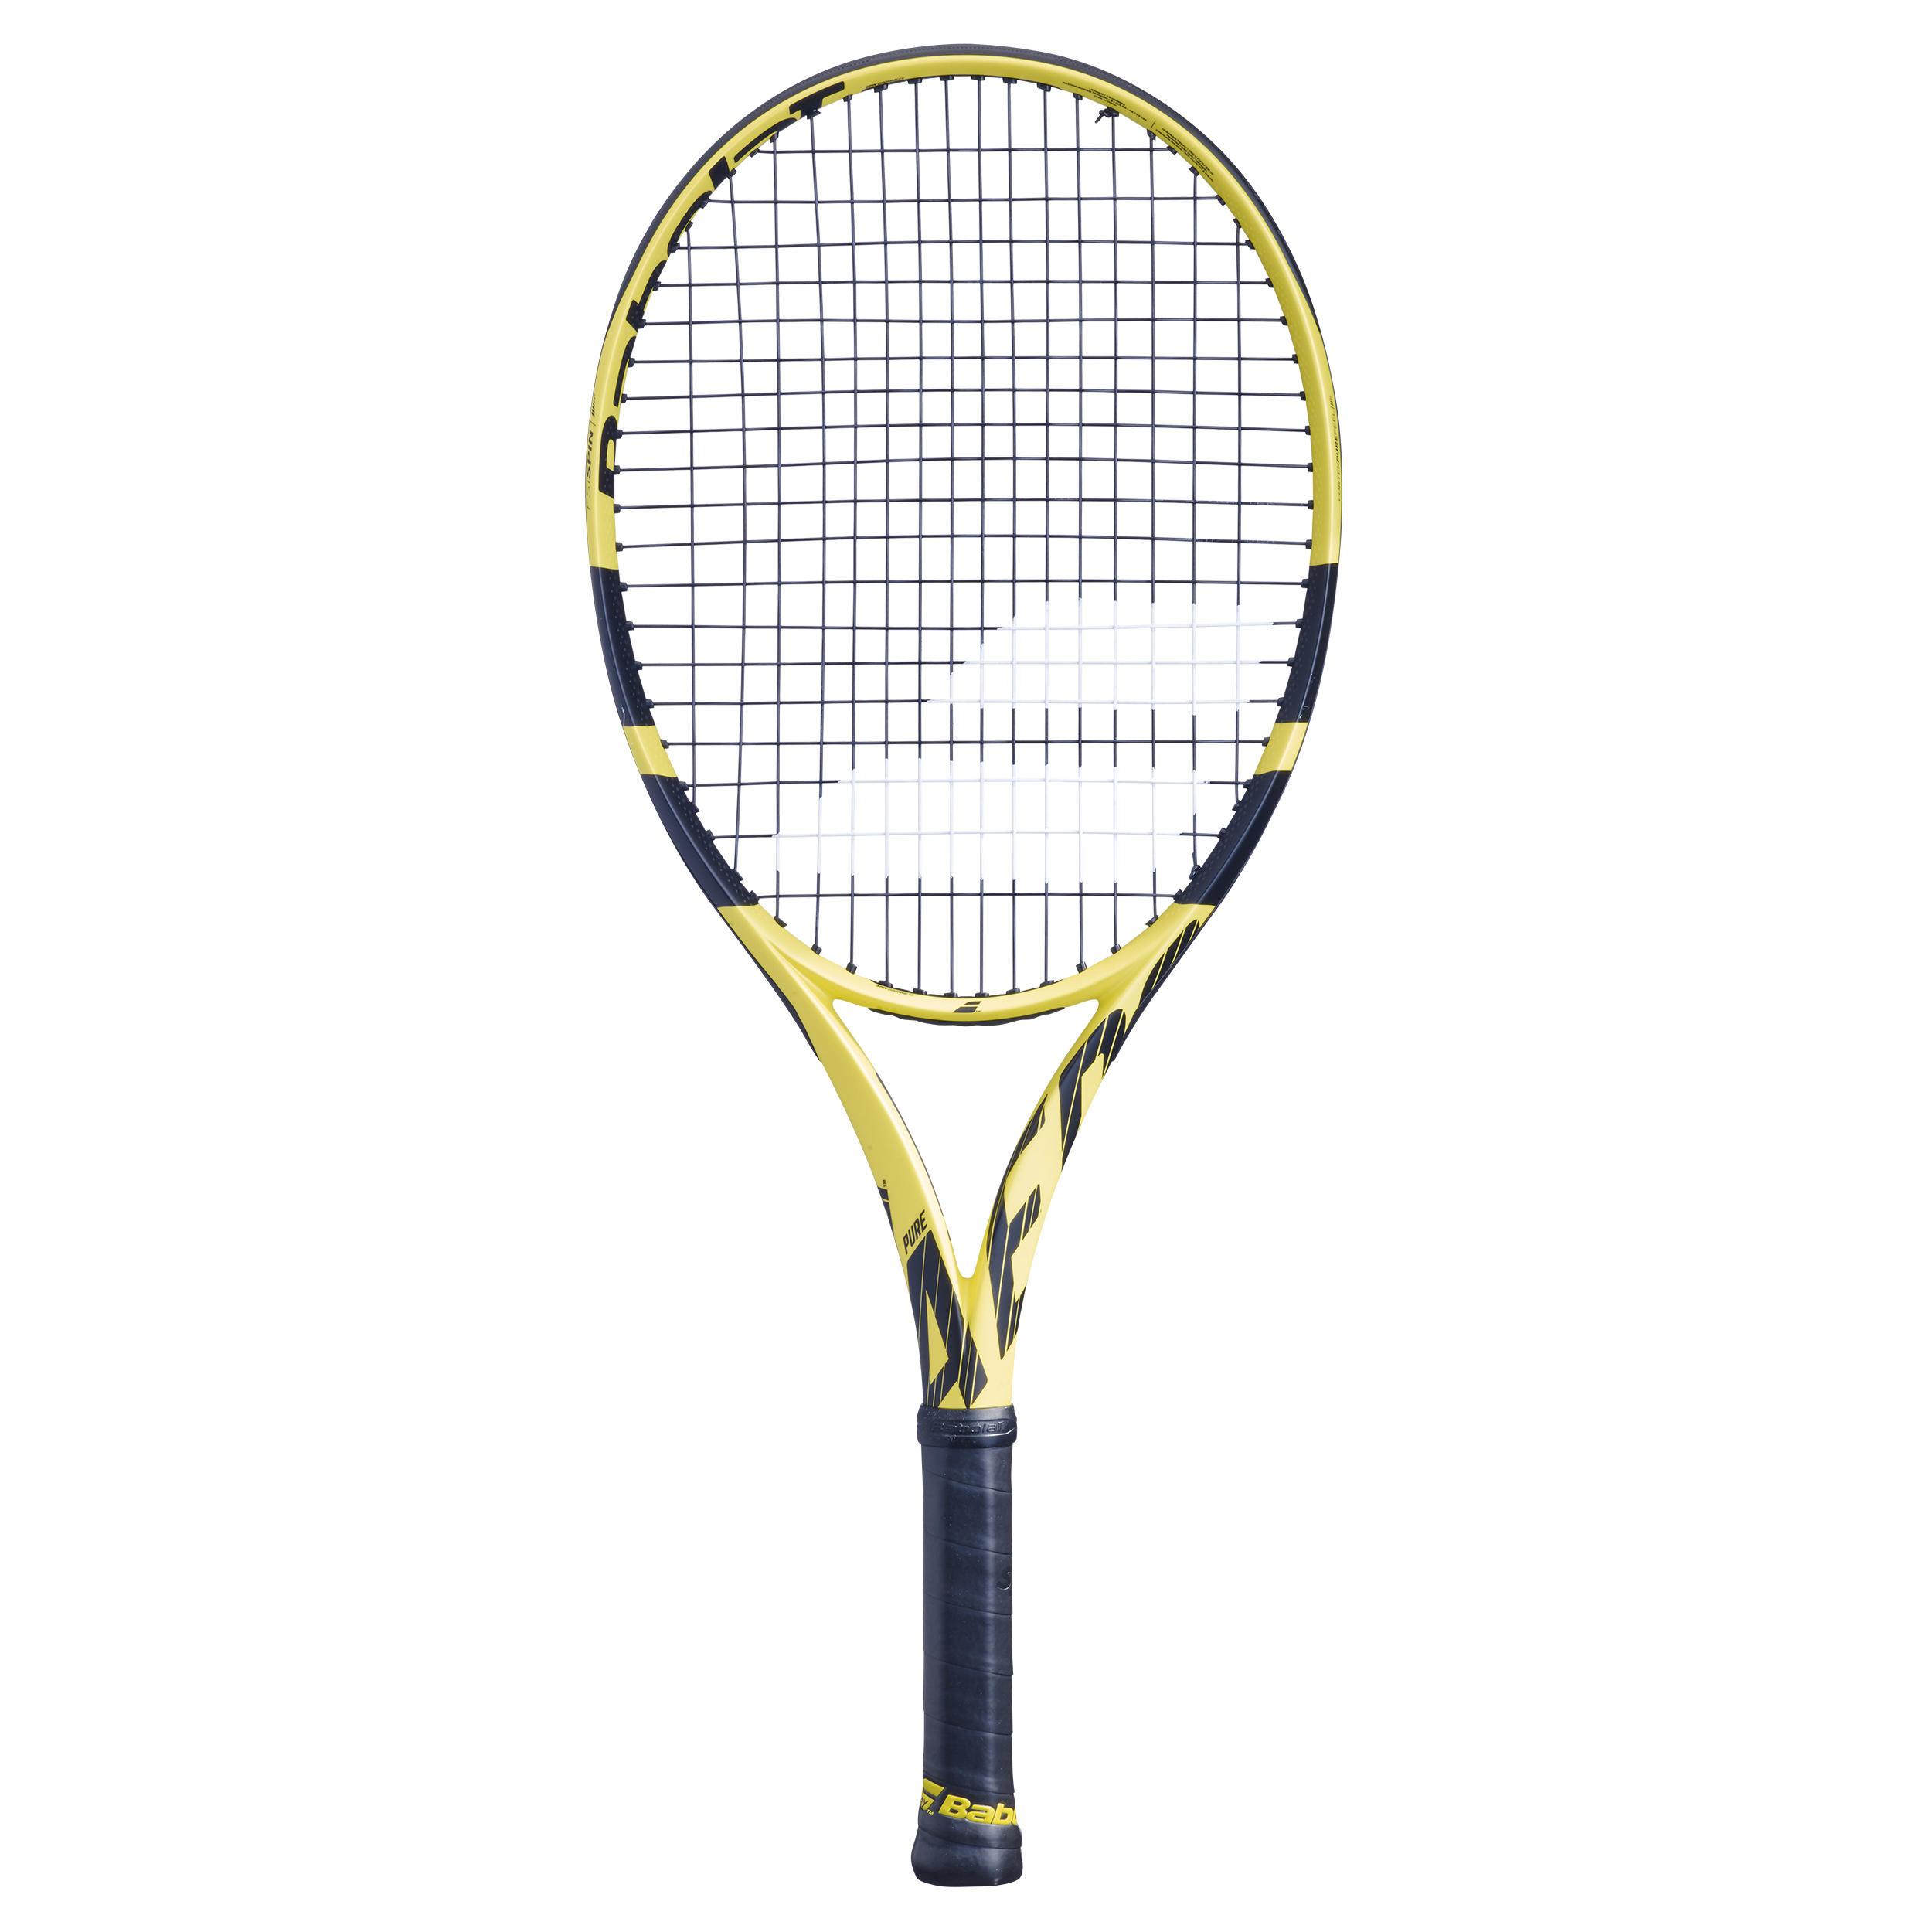 ec5acd14b9b Babolat Tennisracket kinderen Babolat Pure Aero 26 zwart geel 2019 |  Decathlon.nl